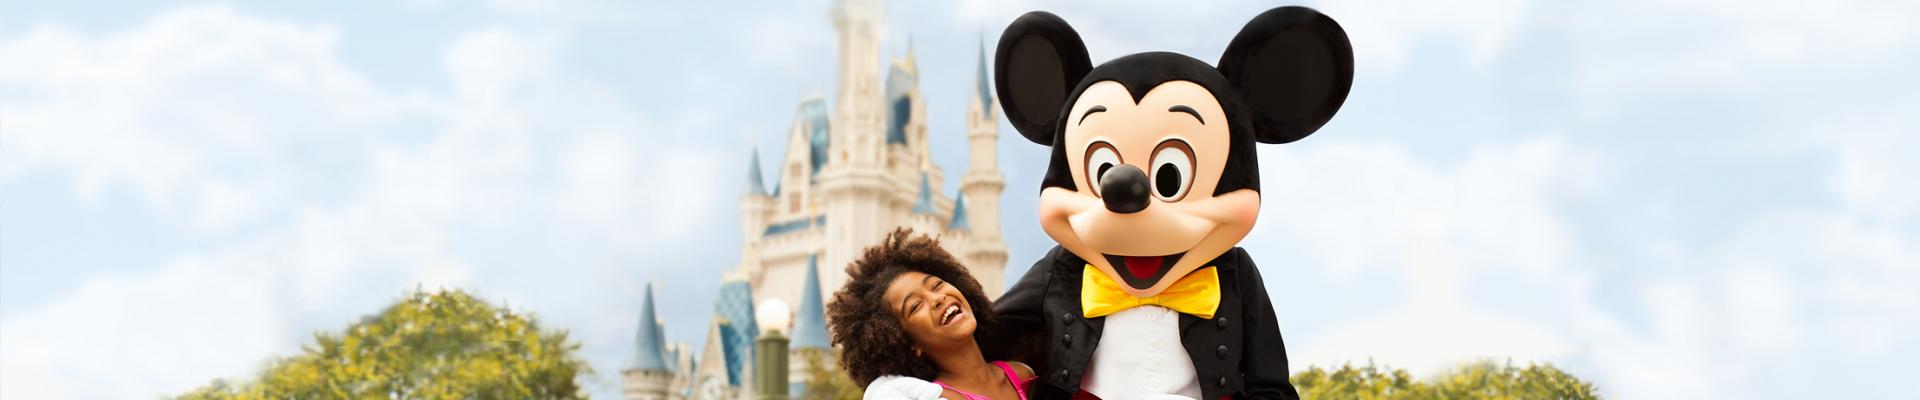 Disney's MyMagic+ & Fast Pass